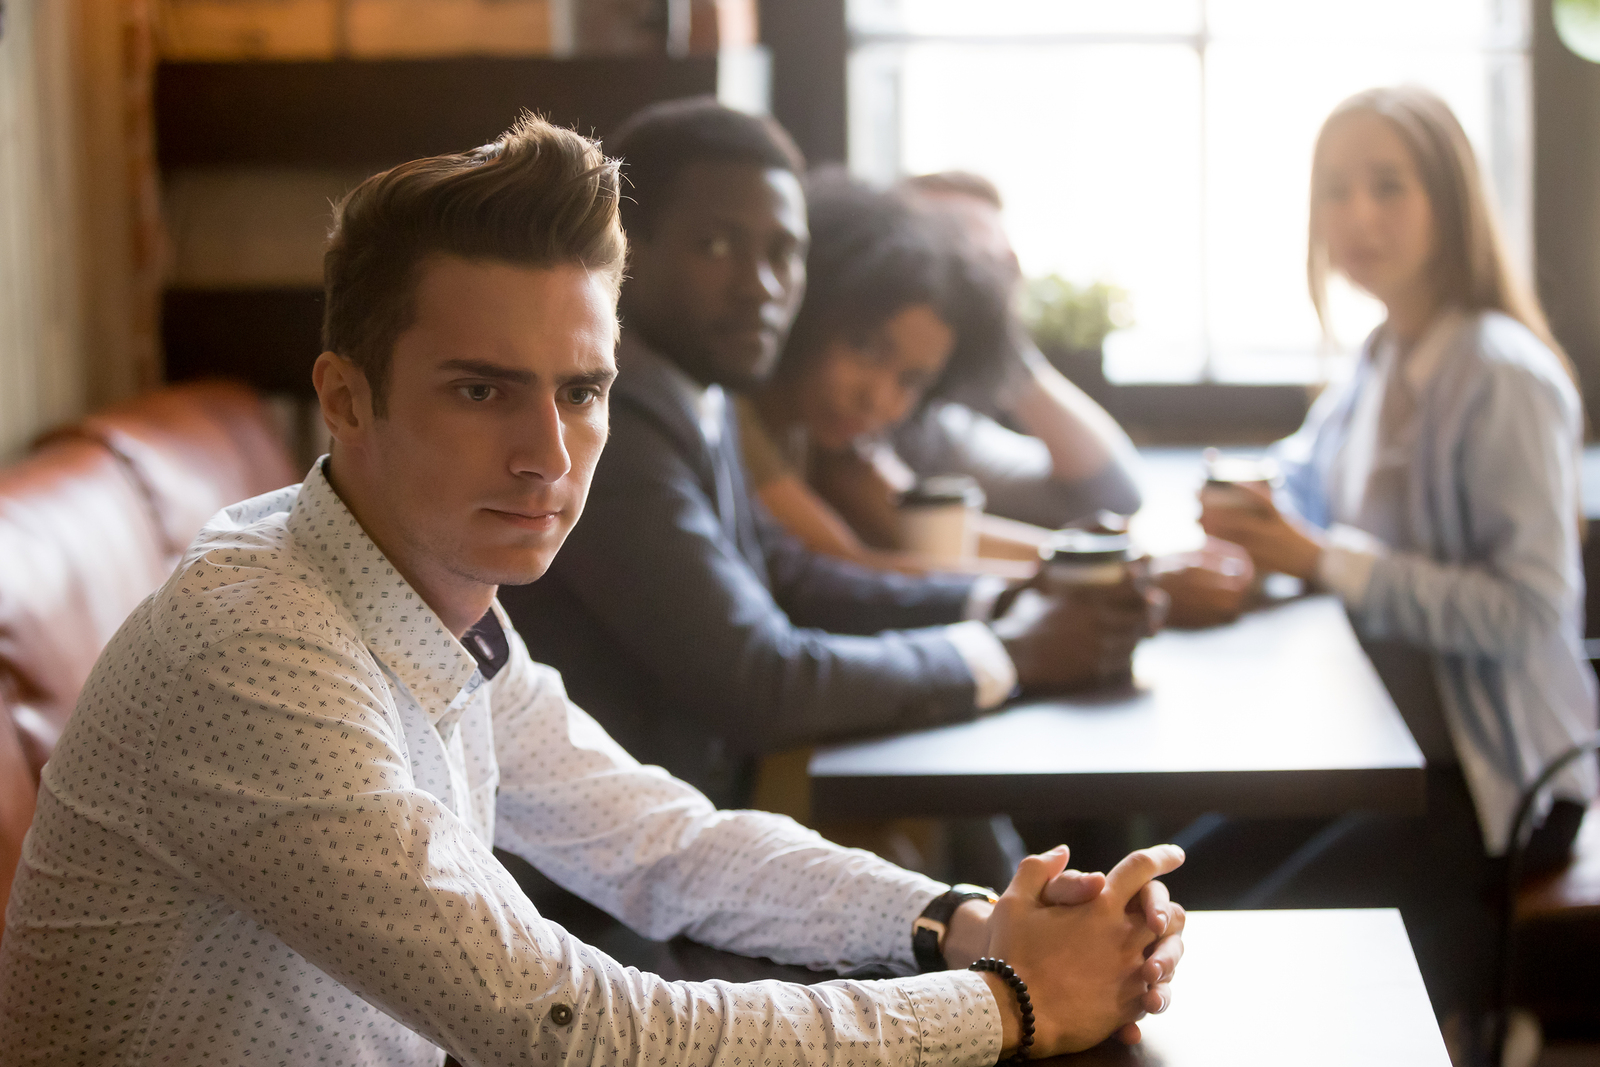 Overcoming the Stigma of Mental Illness